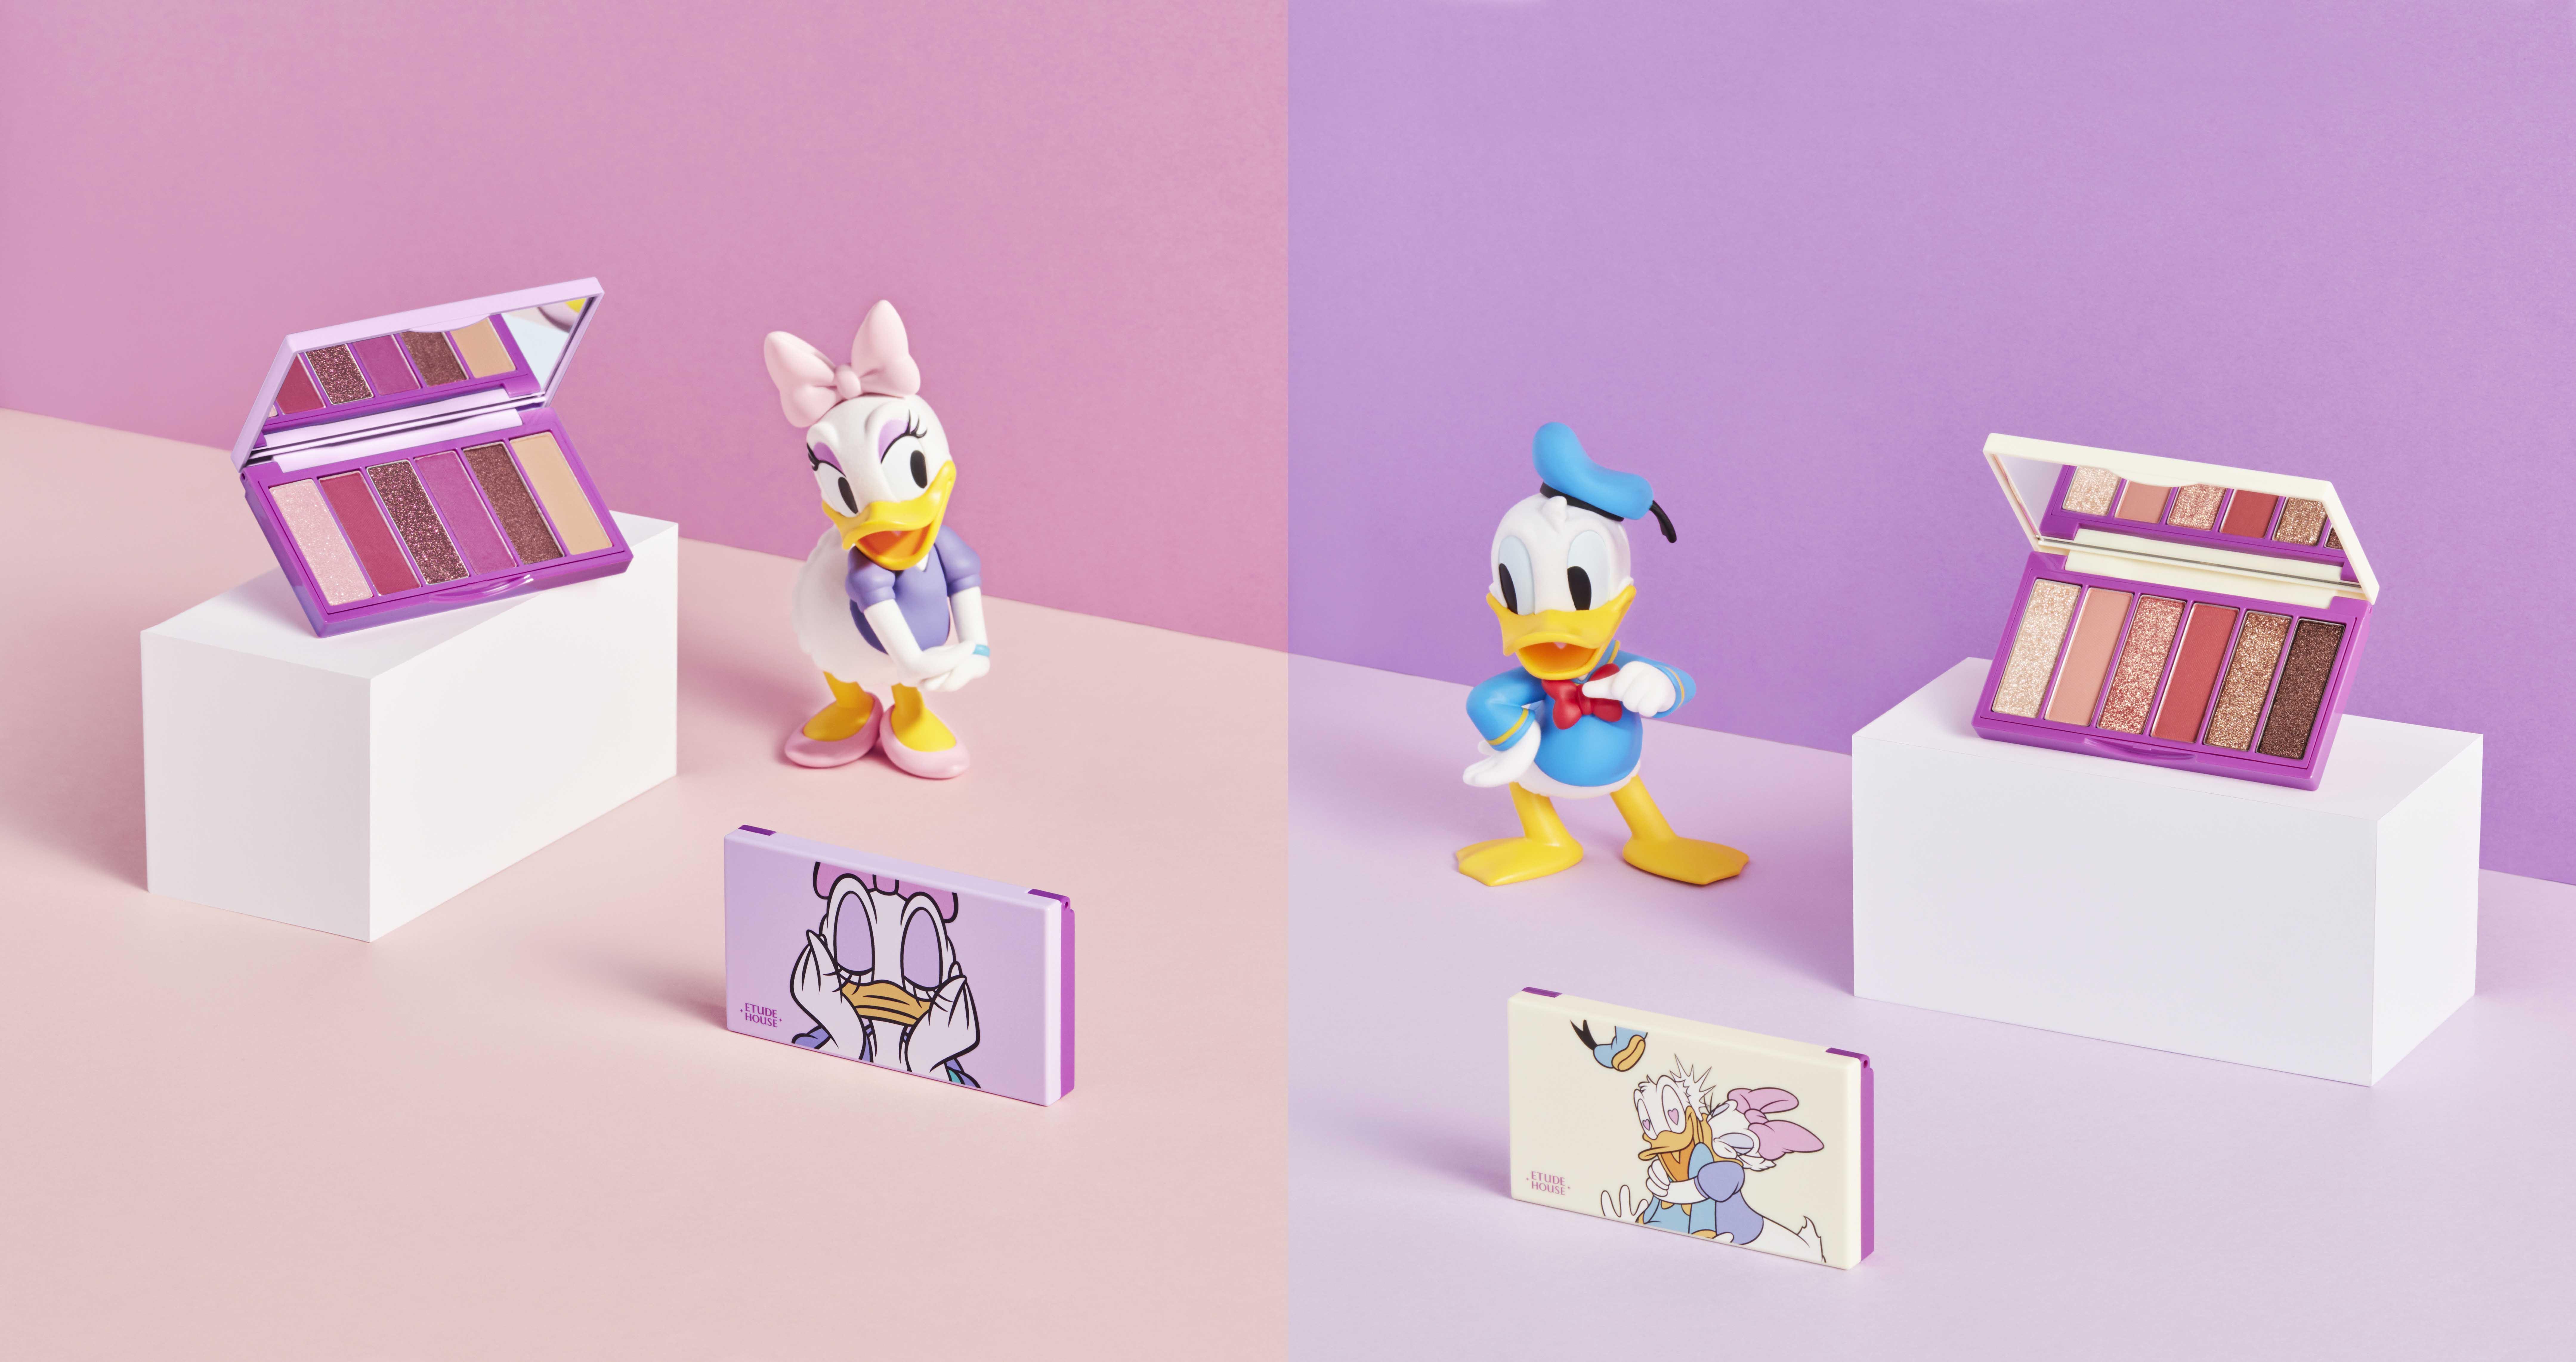 Etude House Daisy Duck Collection Play Color Eyes Mini